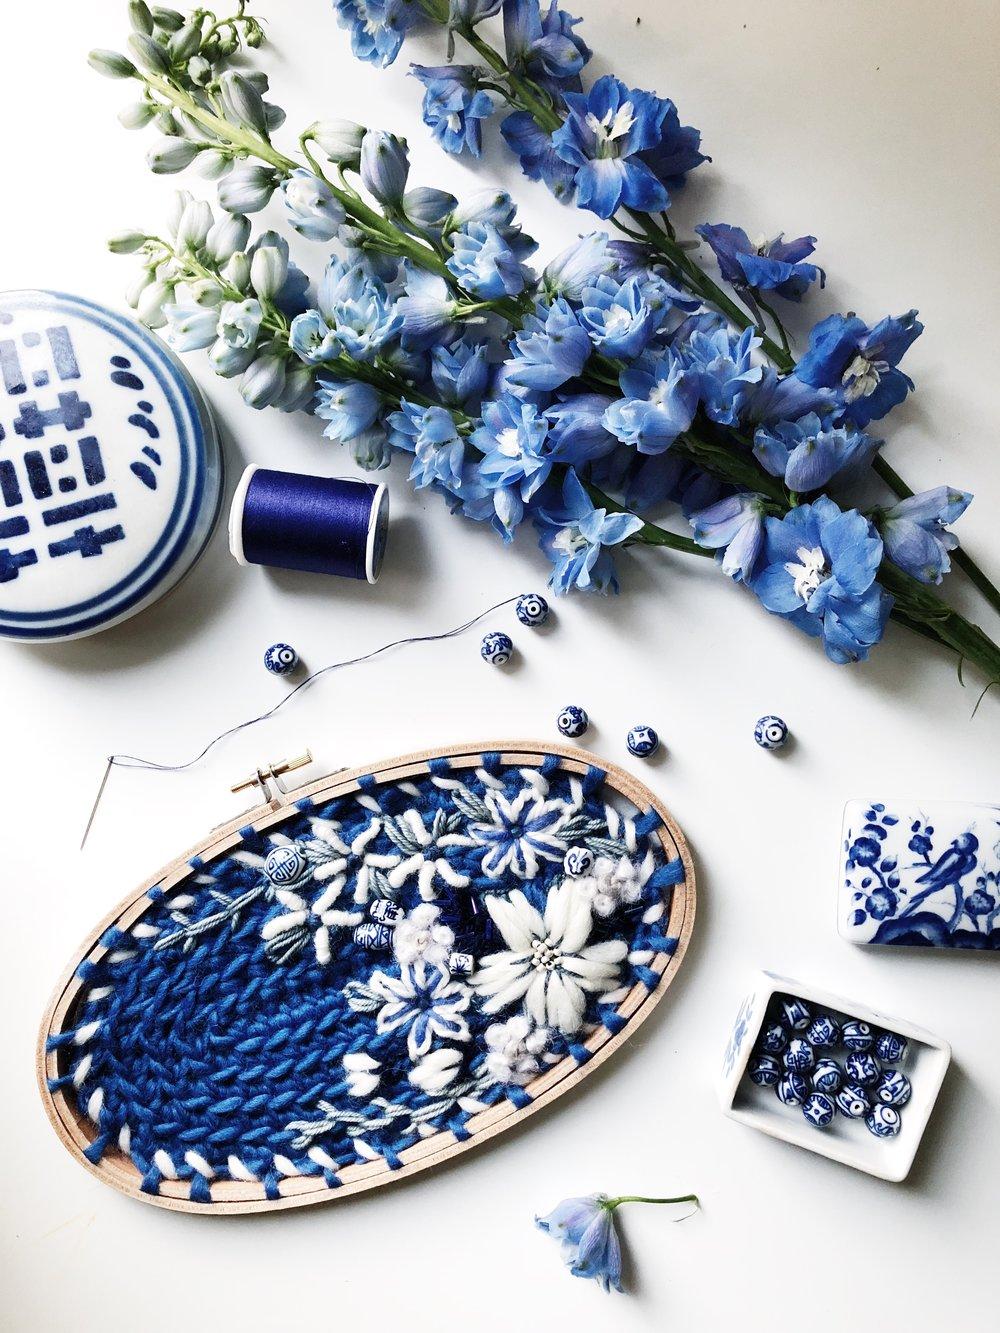 oandystudio.chinoiserie.delft.bleu.blue.fibre.art.hanging.embroidery.hoop.crewel.tapestry.crochet.flower